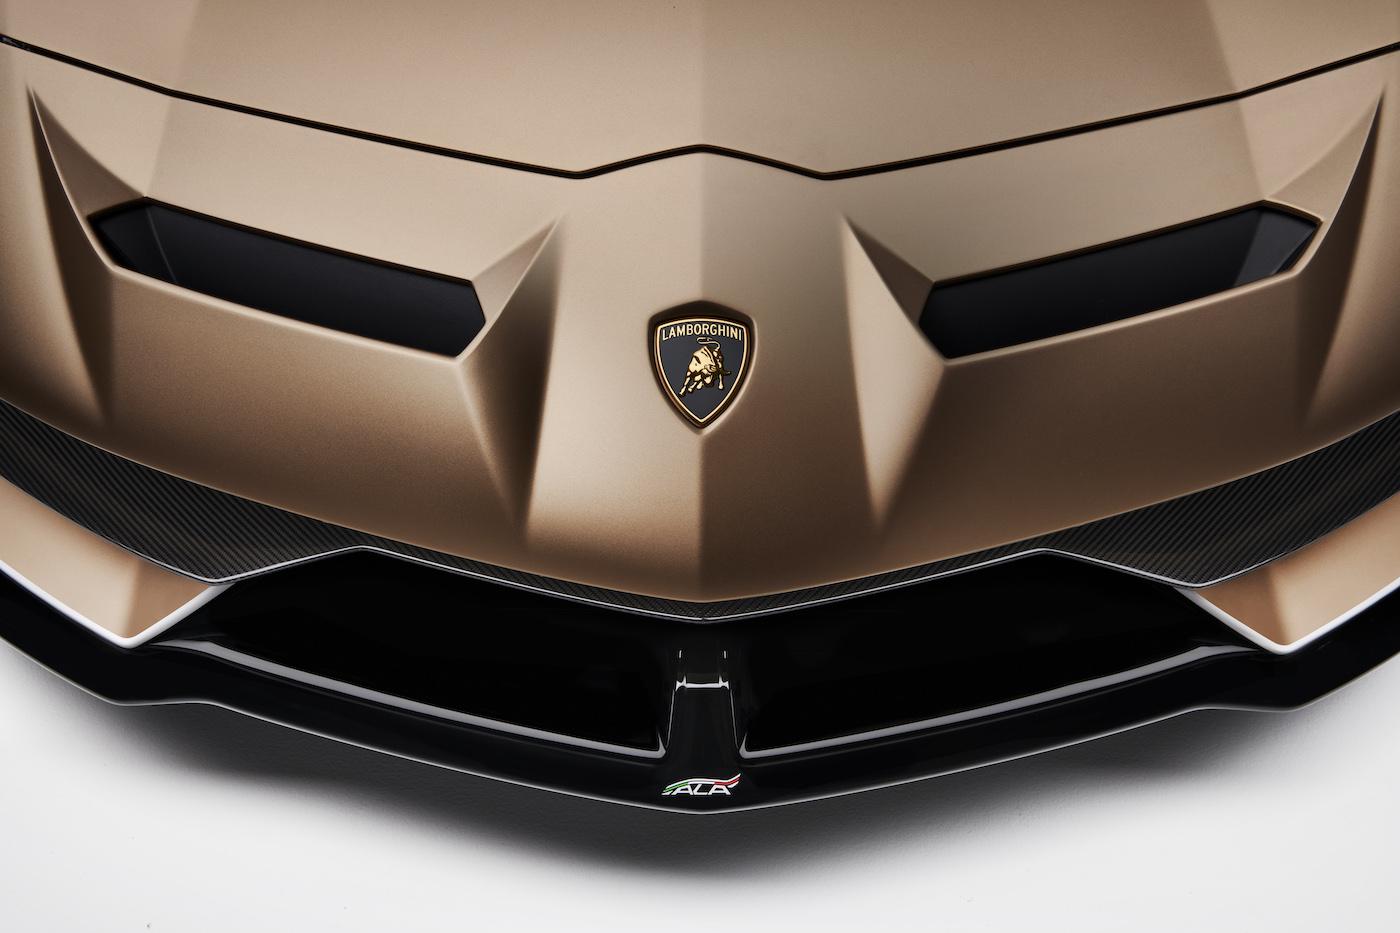 Oben ohne mit 350 km/h: Lamborghini präsentiert den Aventador SVJ Roadster in Genf 14